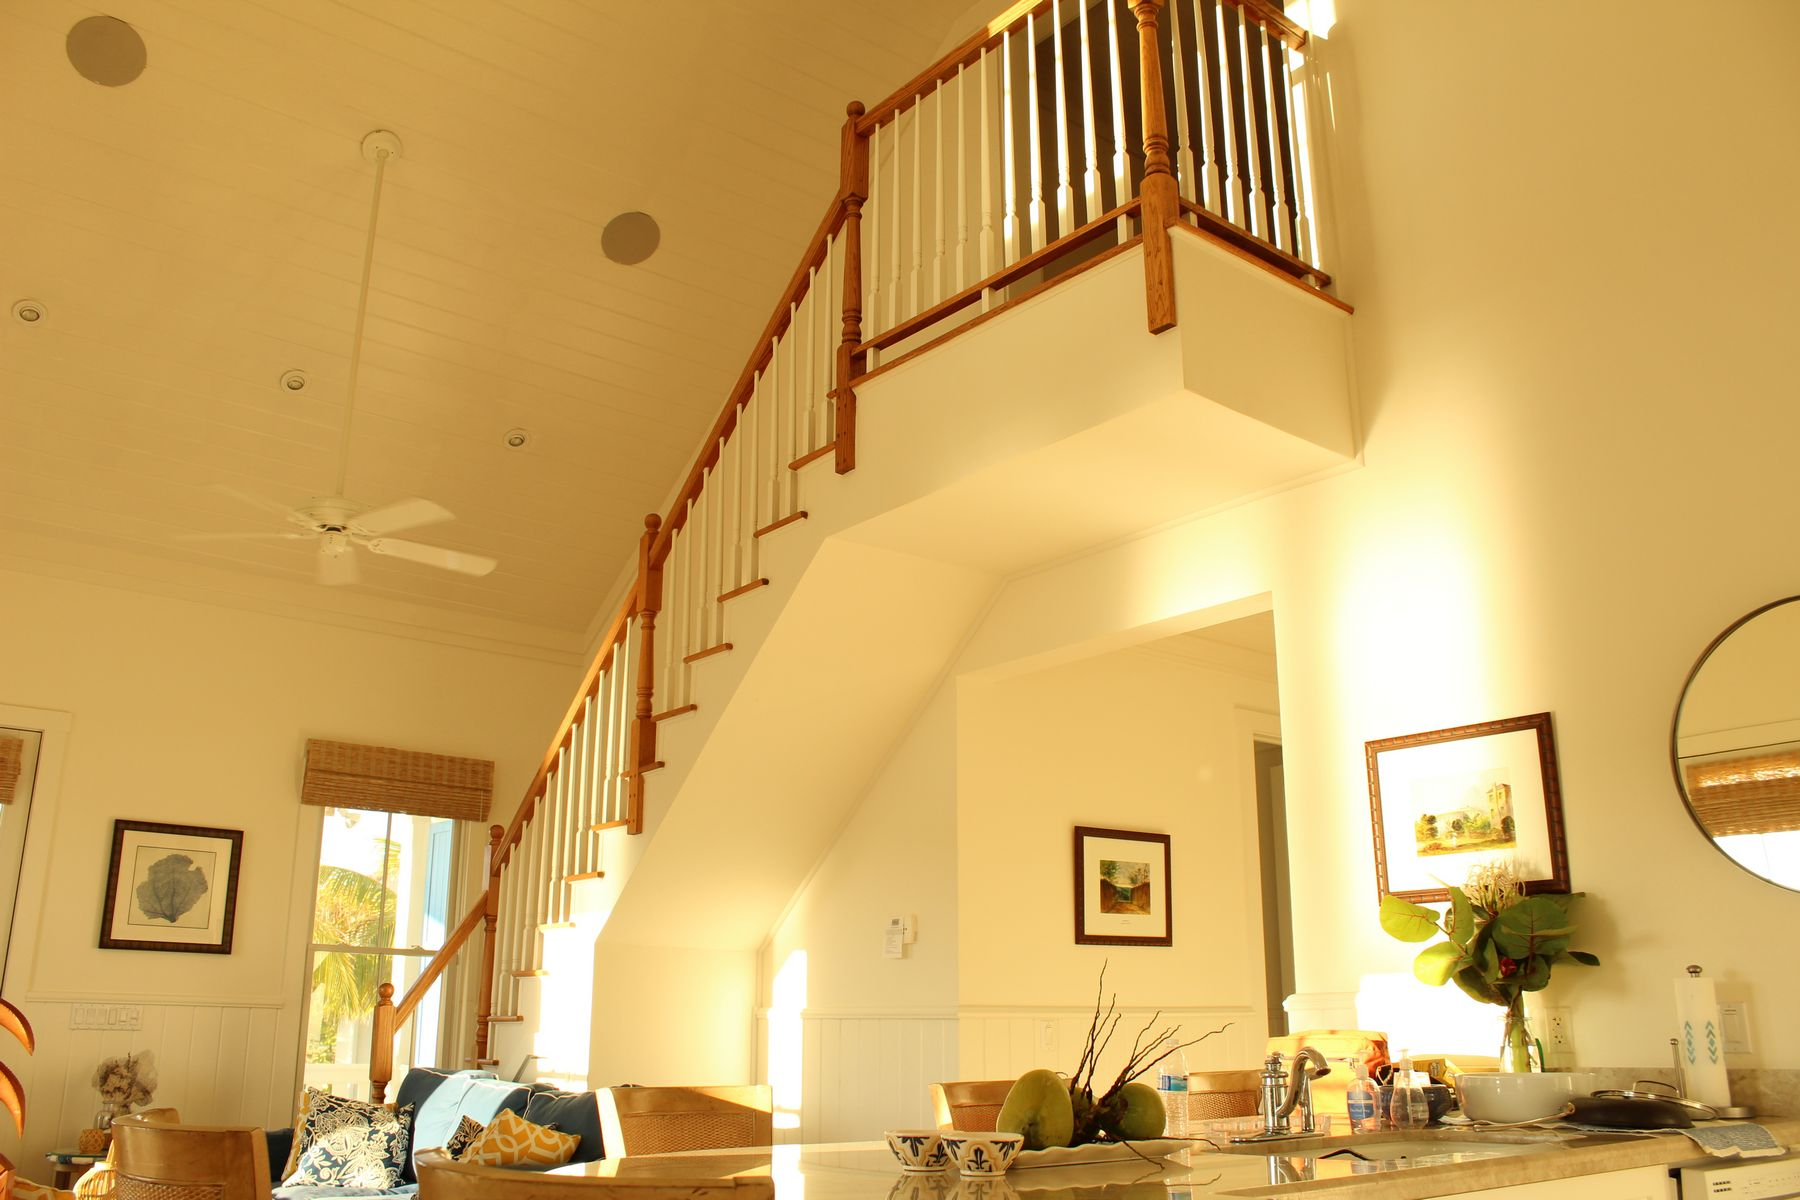 Additional photo for property listing at Azure Way Cottage at Schooner Bay Schooner Bay, Abaco Bahamas